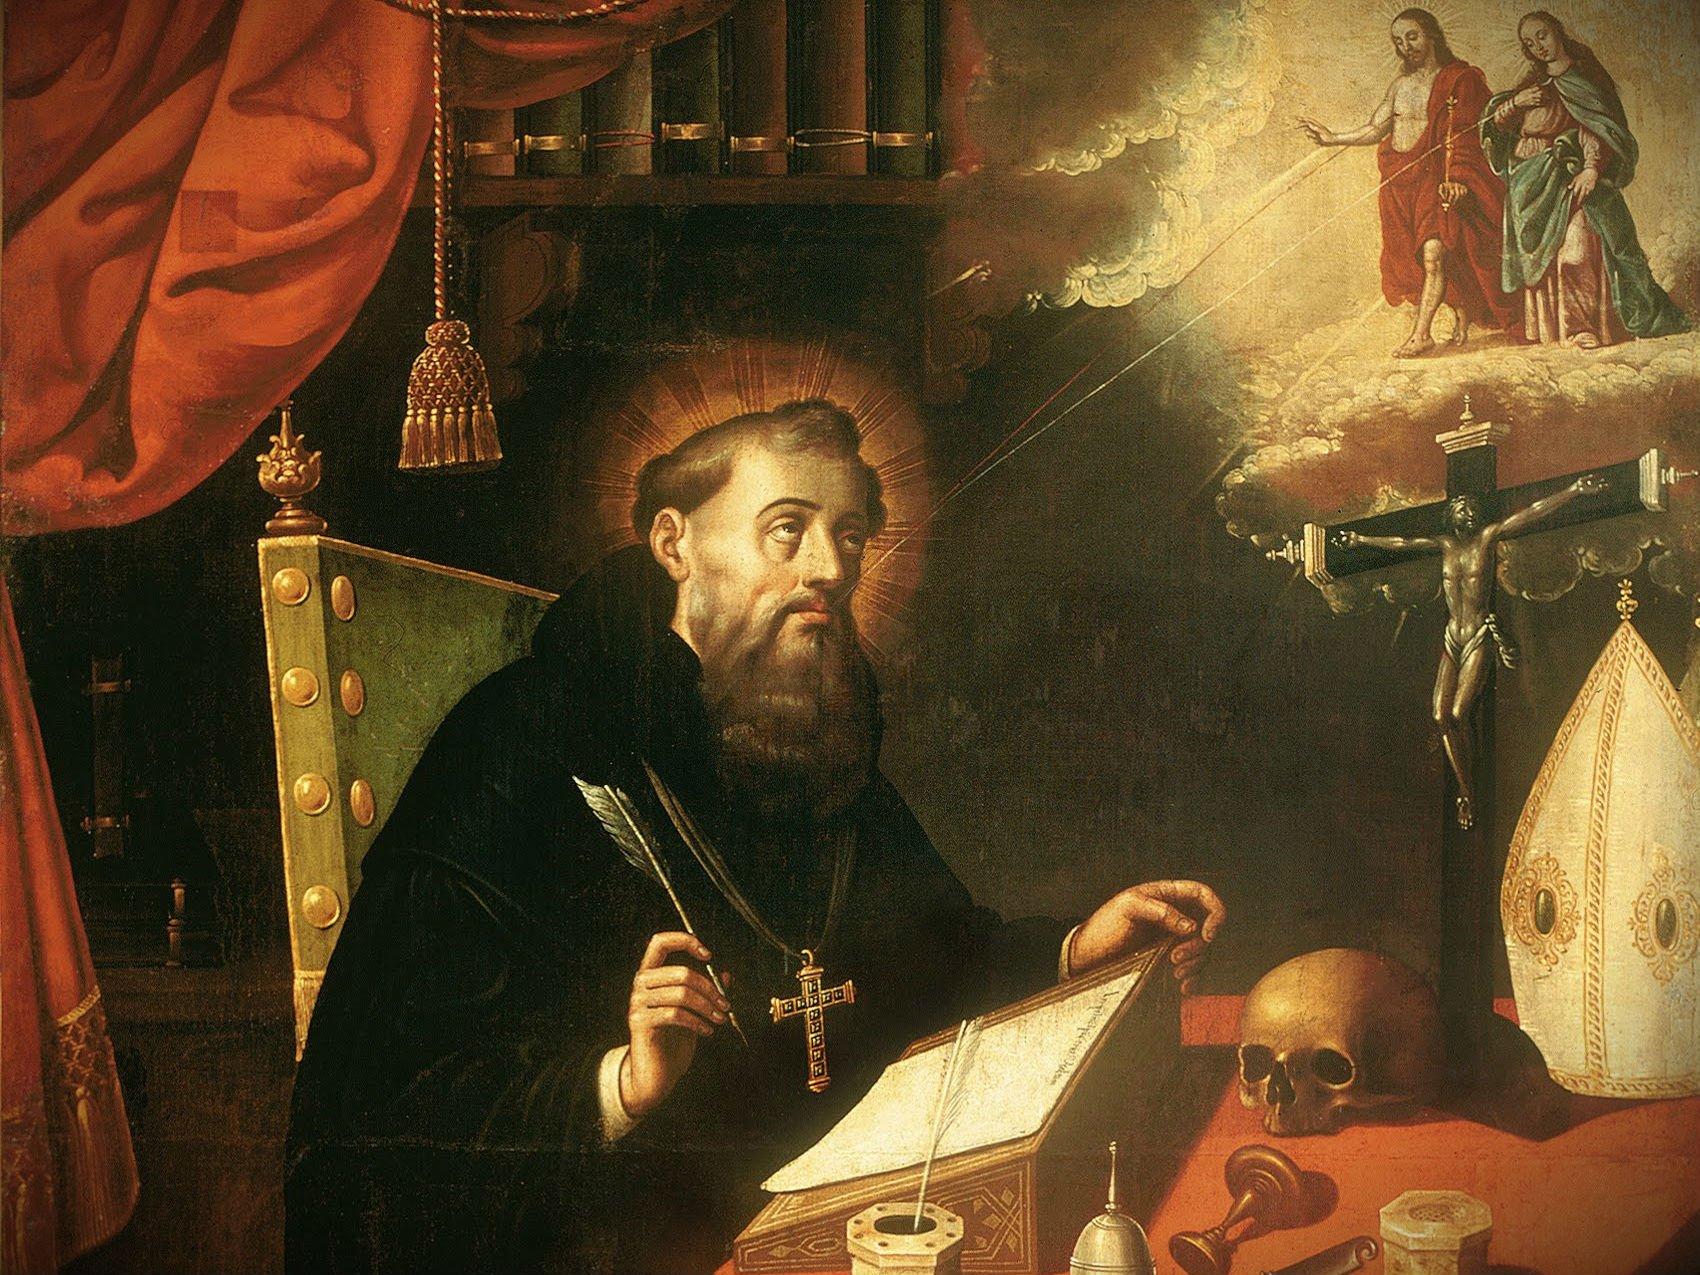 Action & Contemplation, Peter & John – Augustine